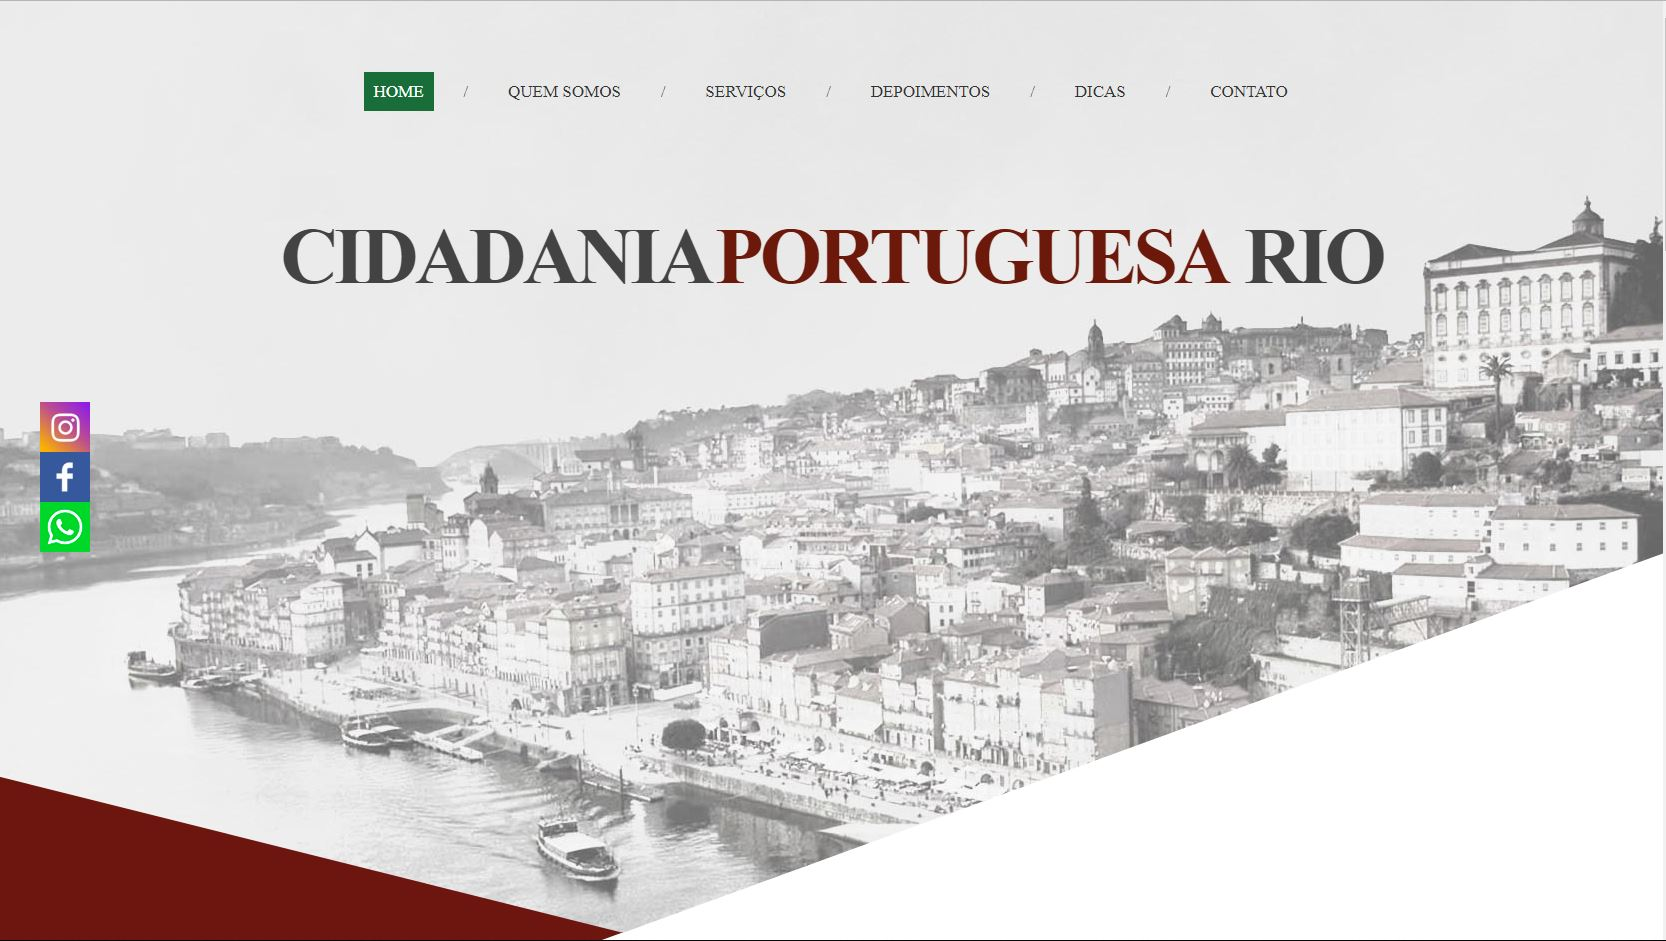 Cidadania Portuguesa Rio